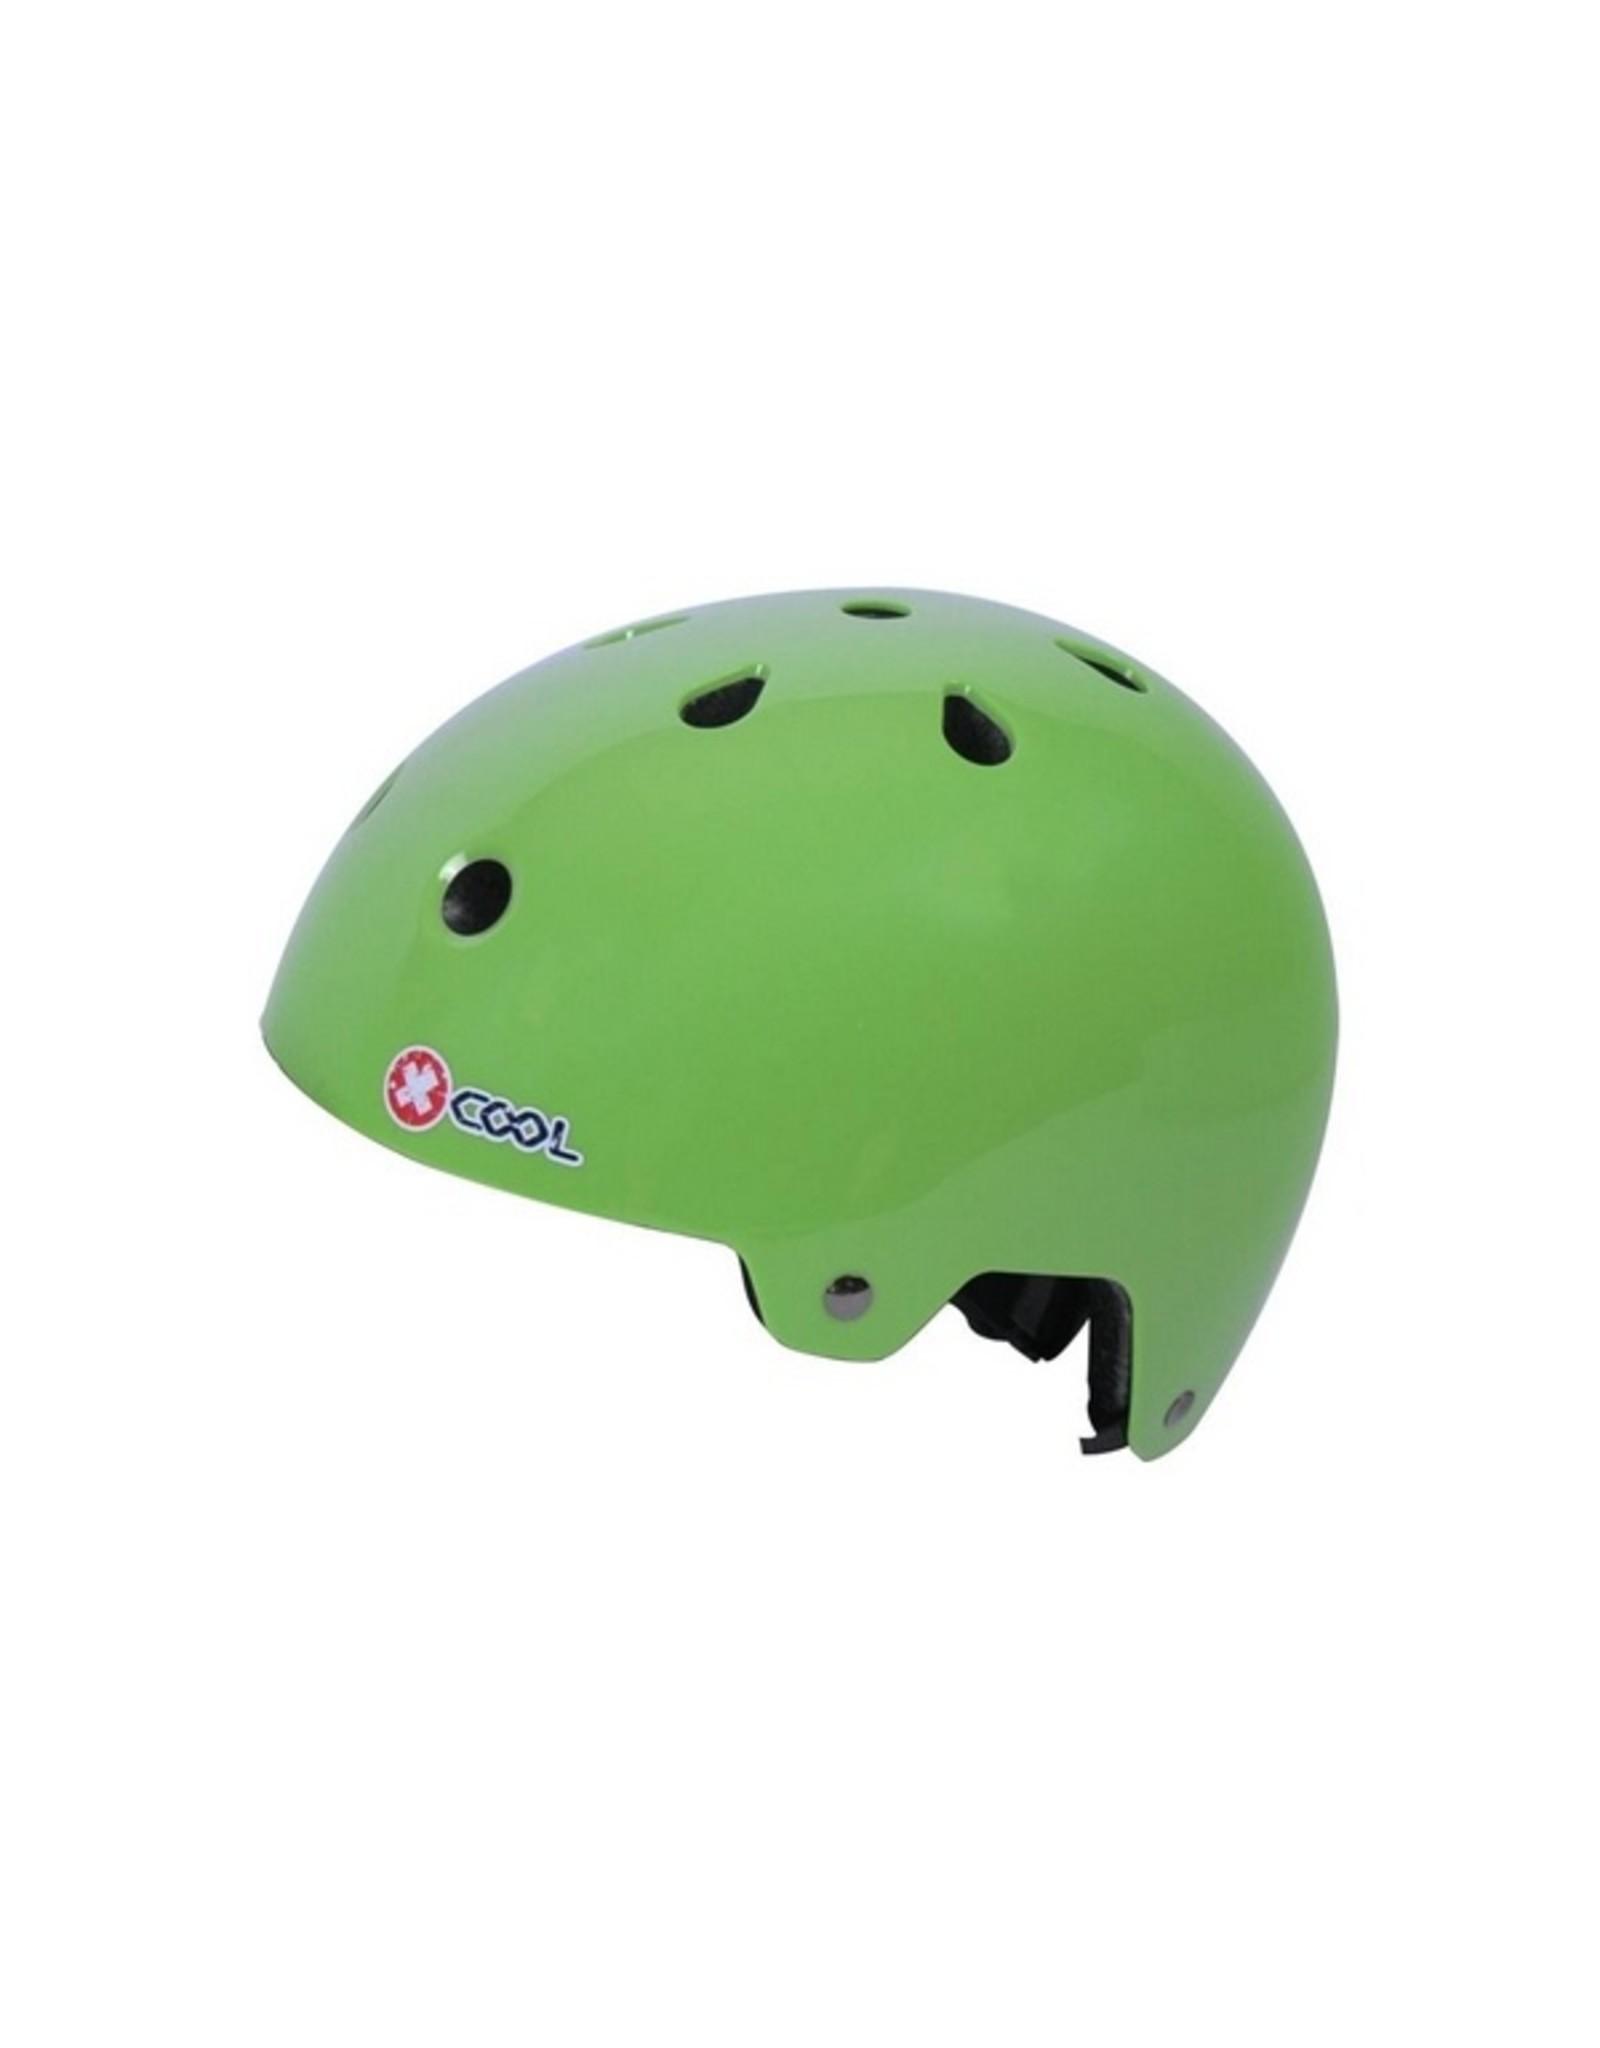 XCOOL fietshelm 2.0 Green bean